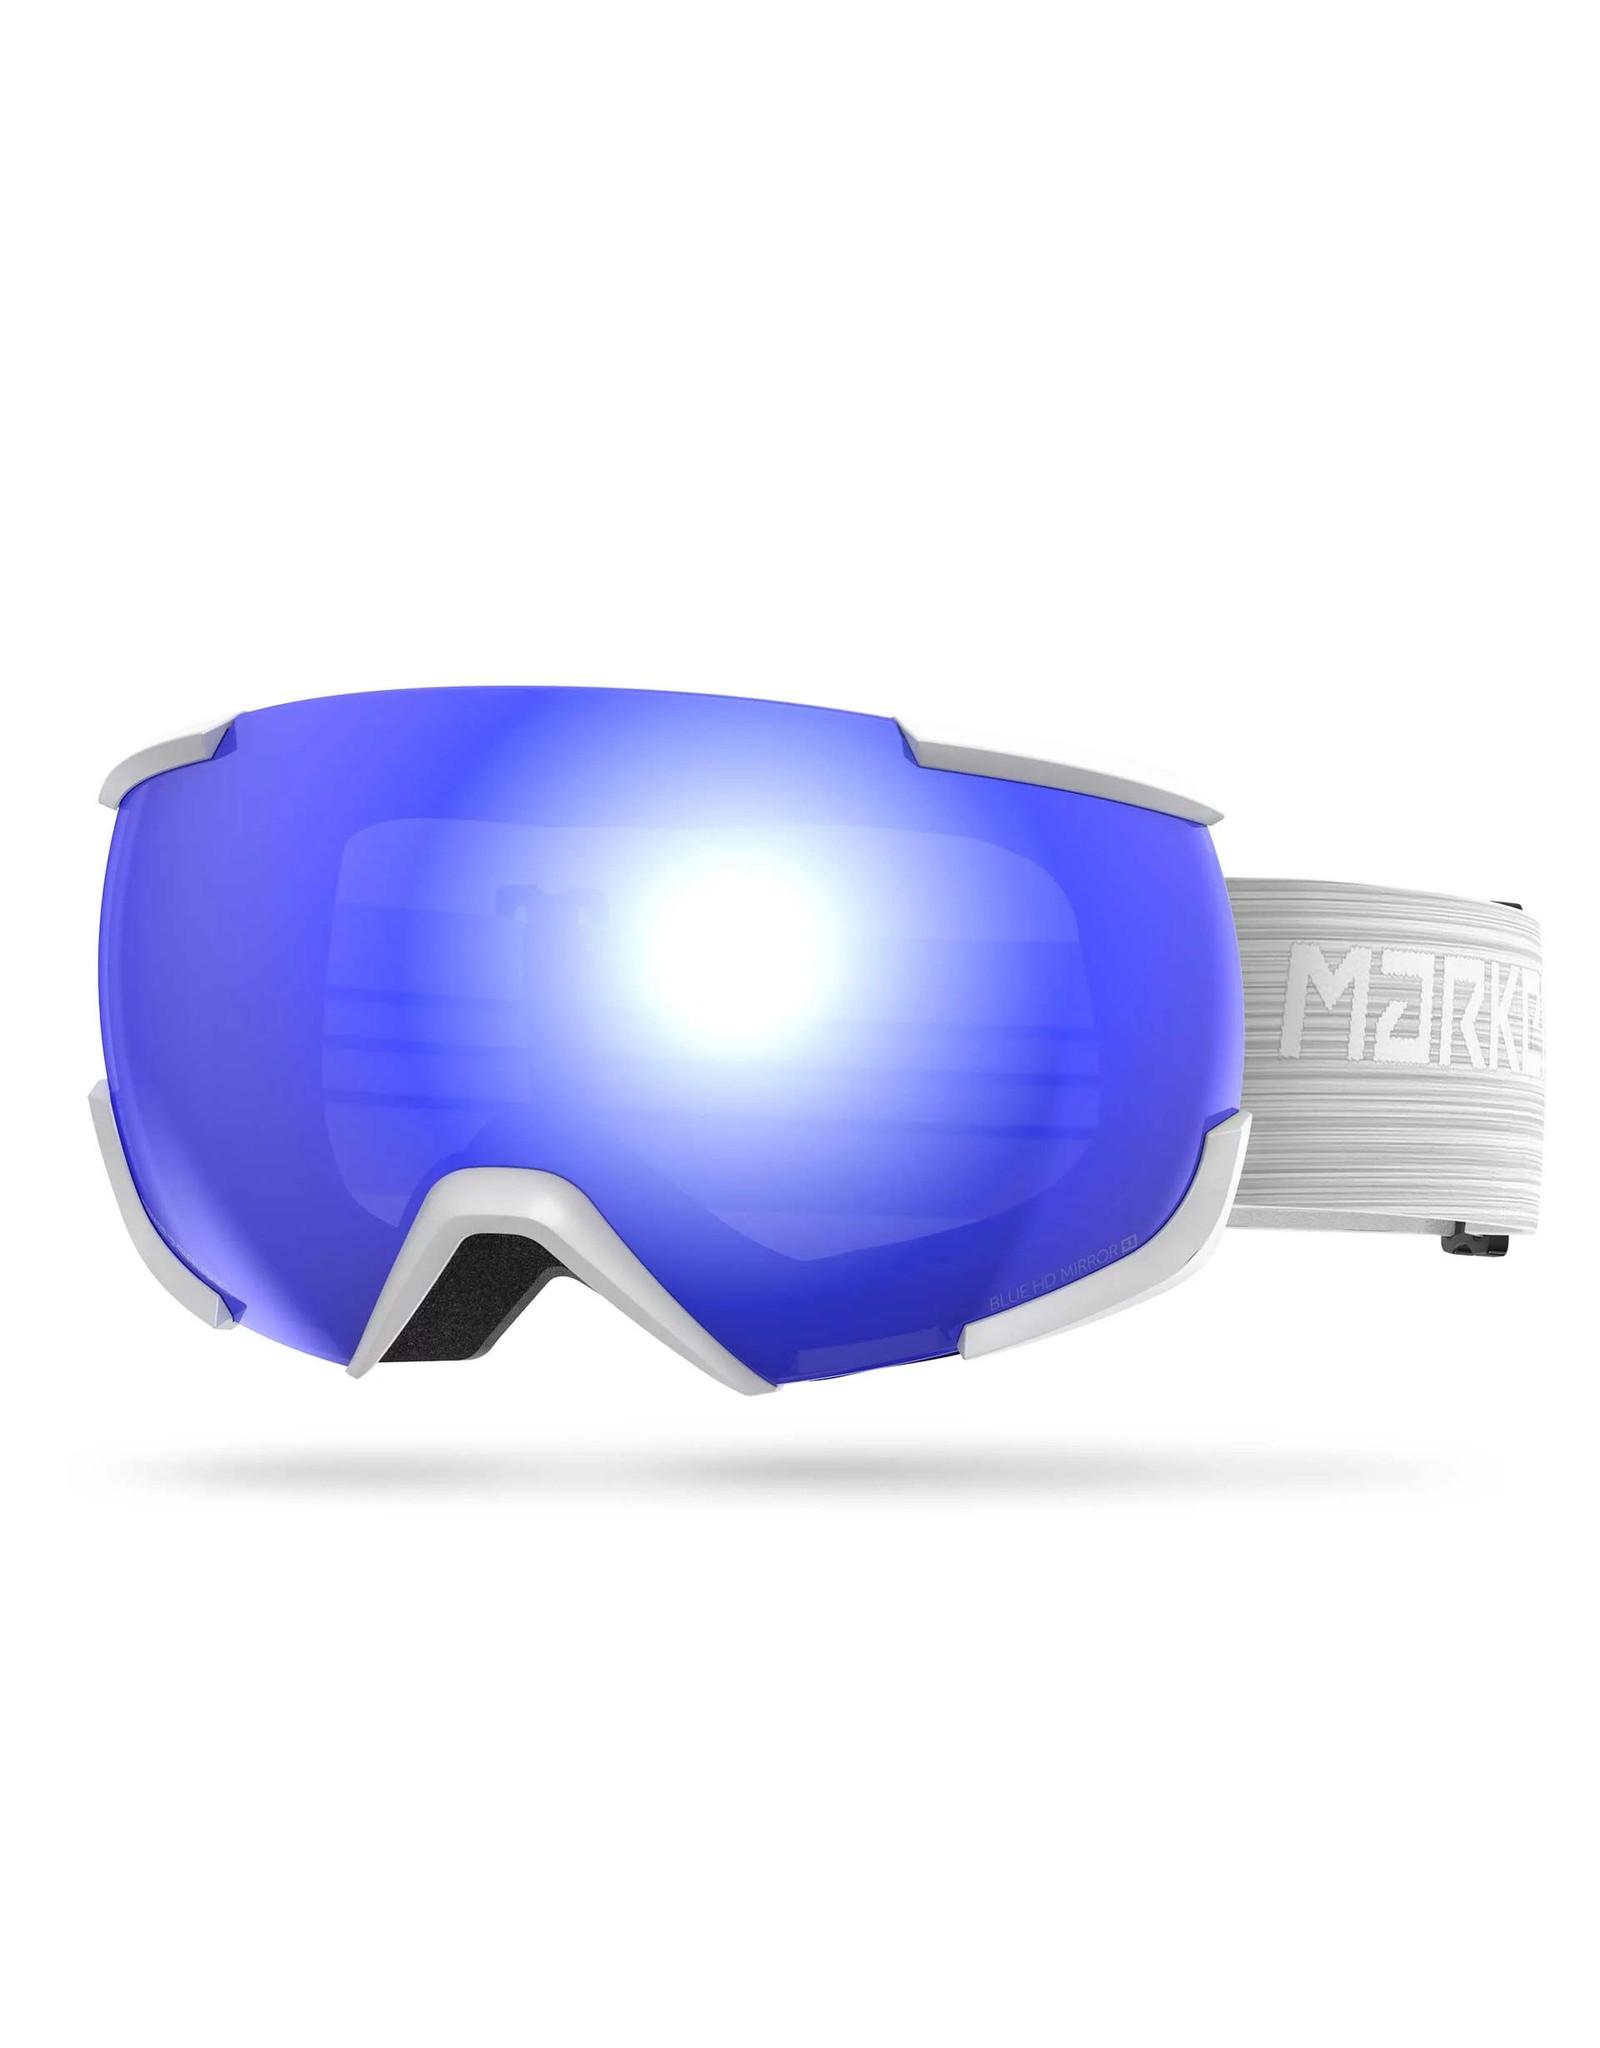 Marker Marker 16:10+ Goggle